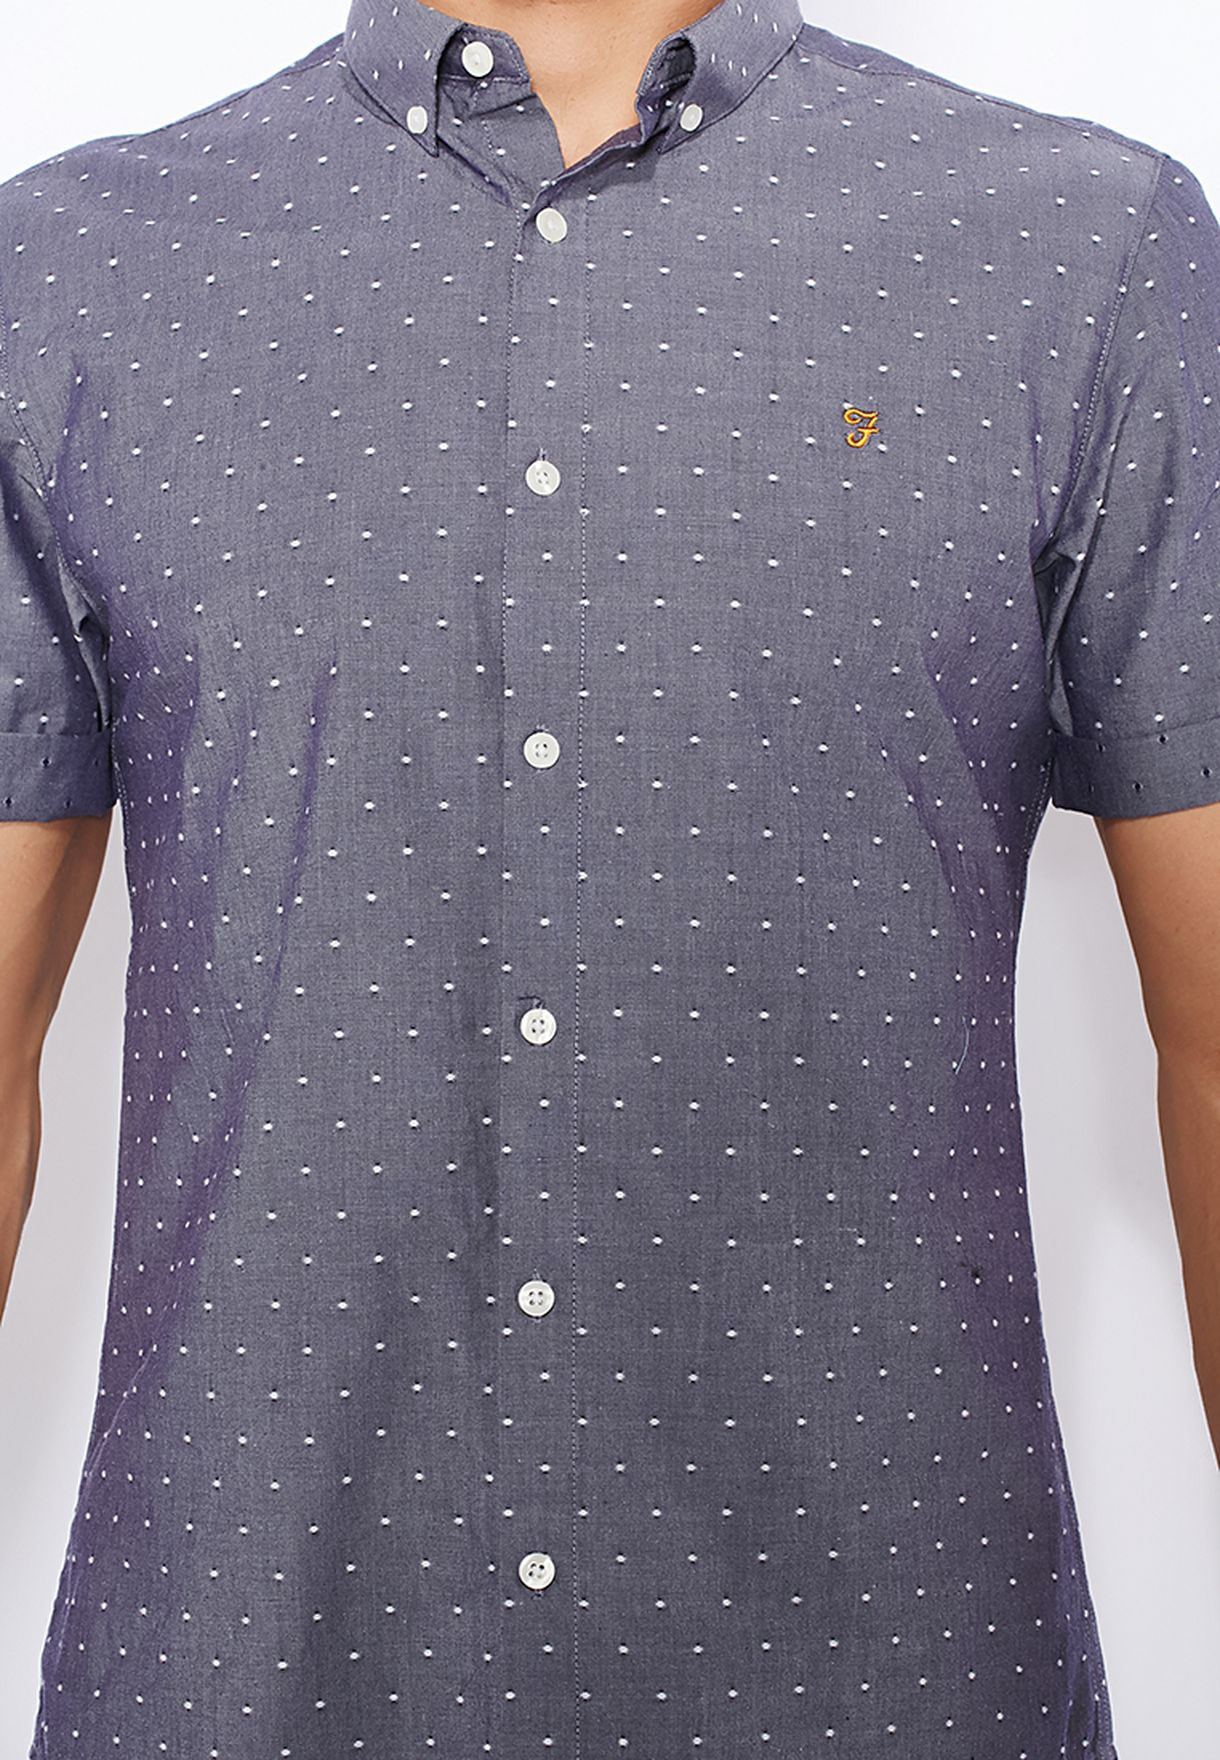 the best attitude ca192 558b4 Birch Slim Fit Shirt